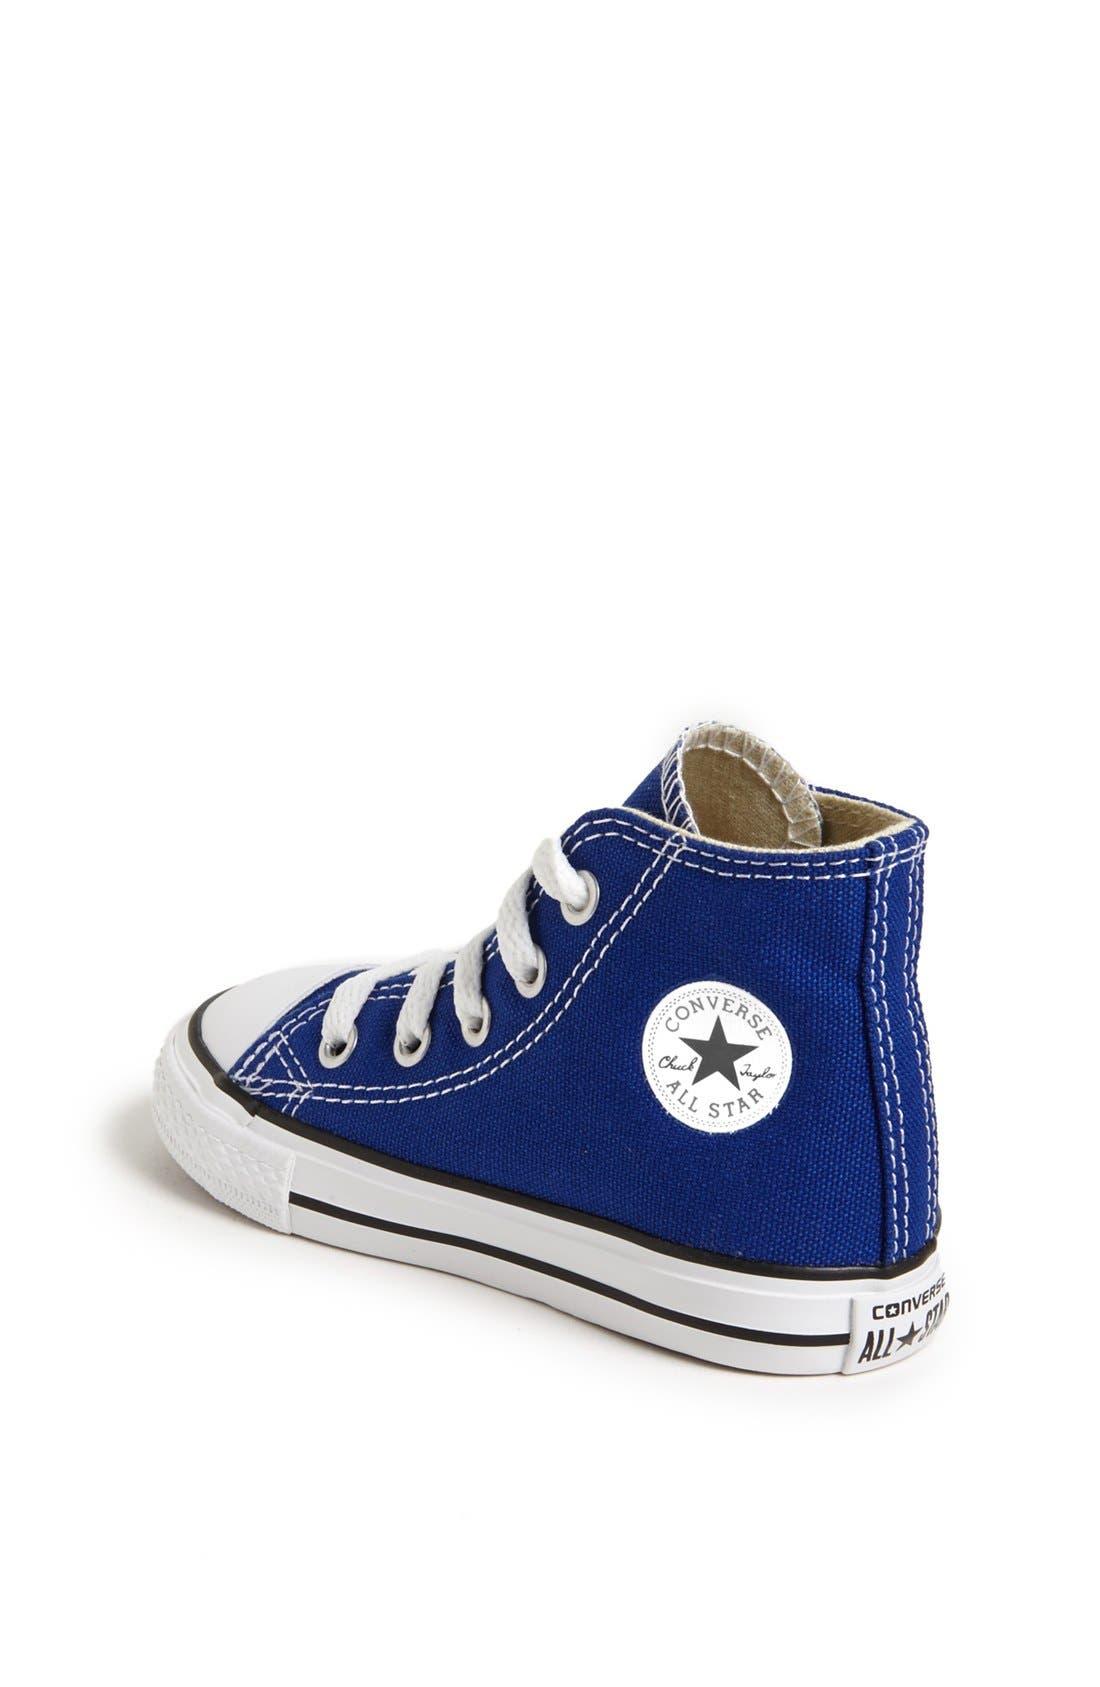 Alternate Image 2  - Converse Chuck Taylor® All Star® High Top Sneaker (Baby, Walker, Toddler & Little Kid)